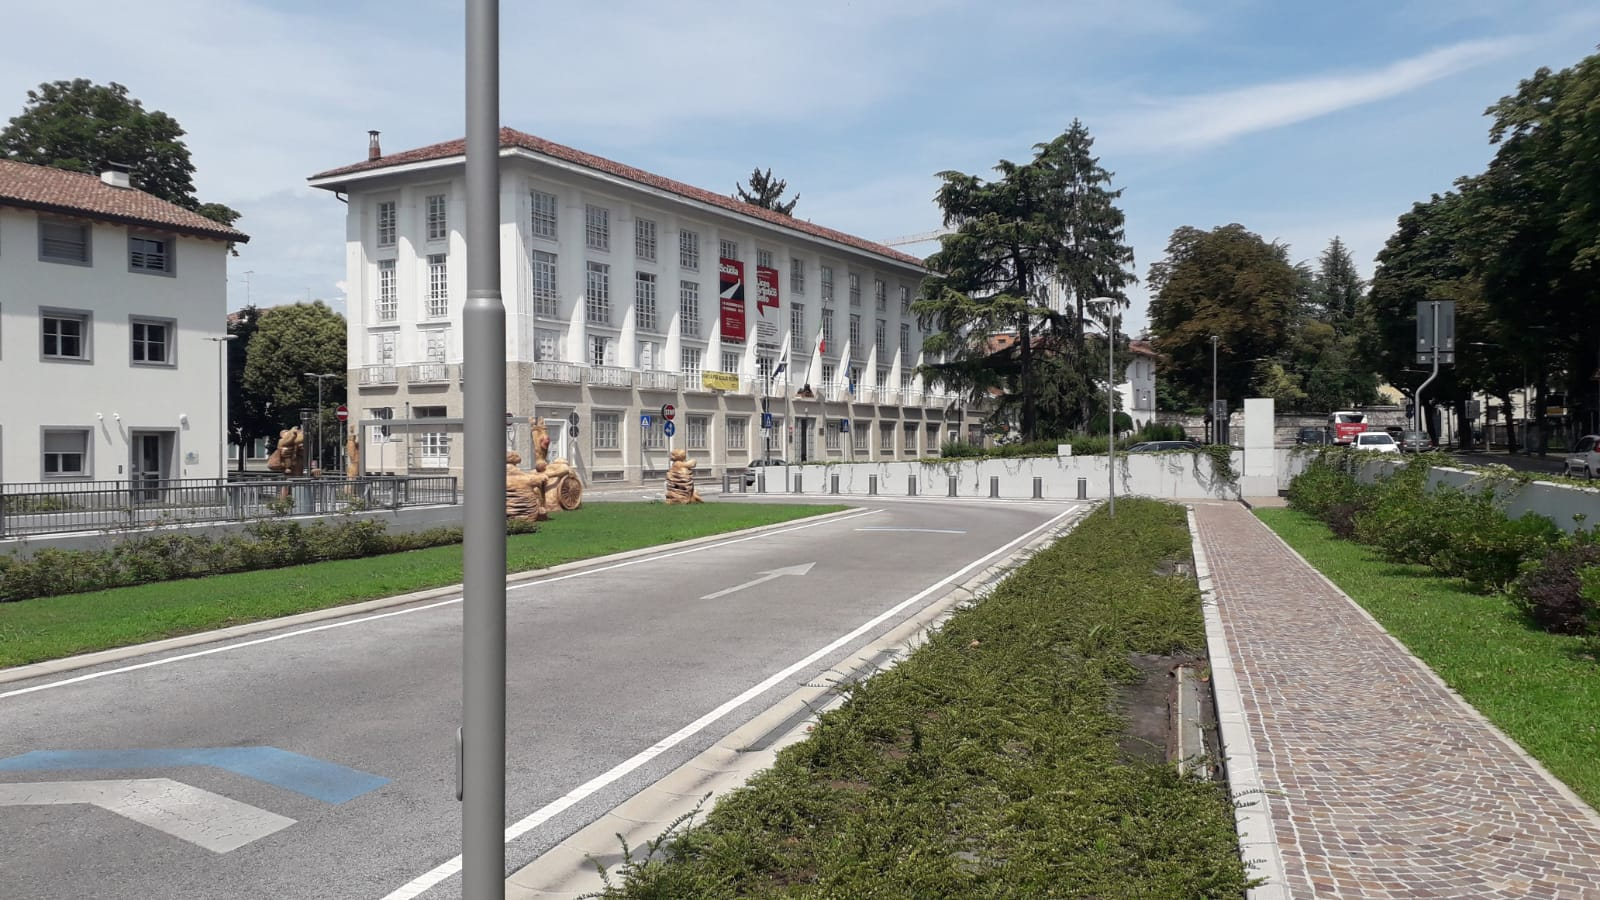 Giardino In Città Udine udine - wikiwand